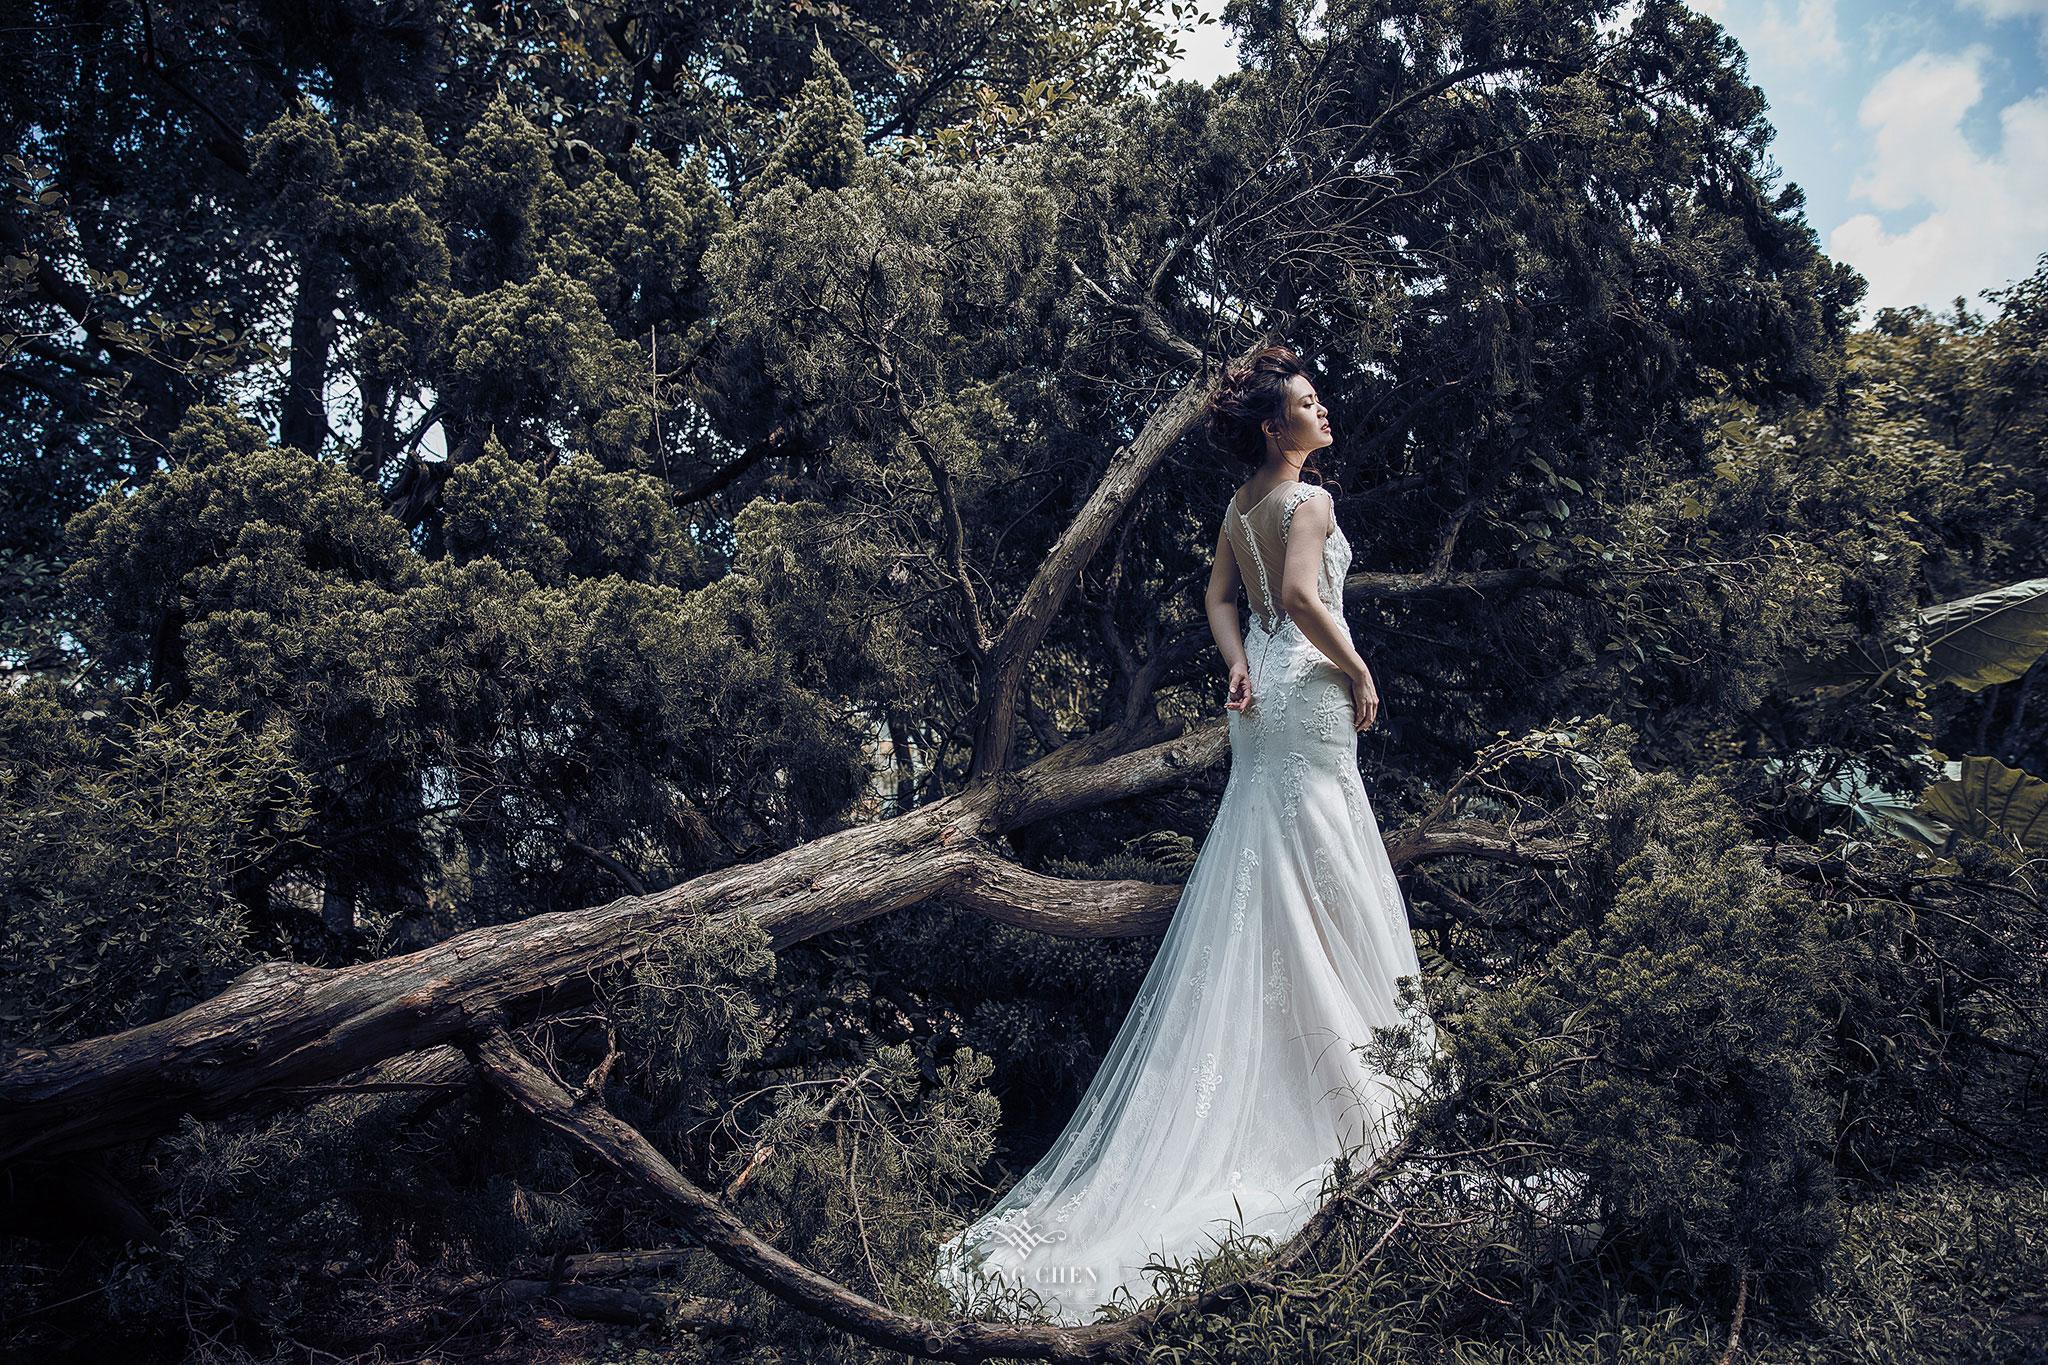 自助婚紗 - Michelle & Tom